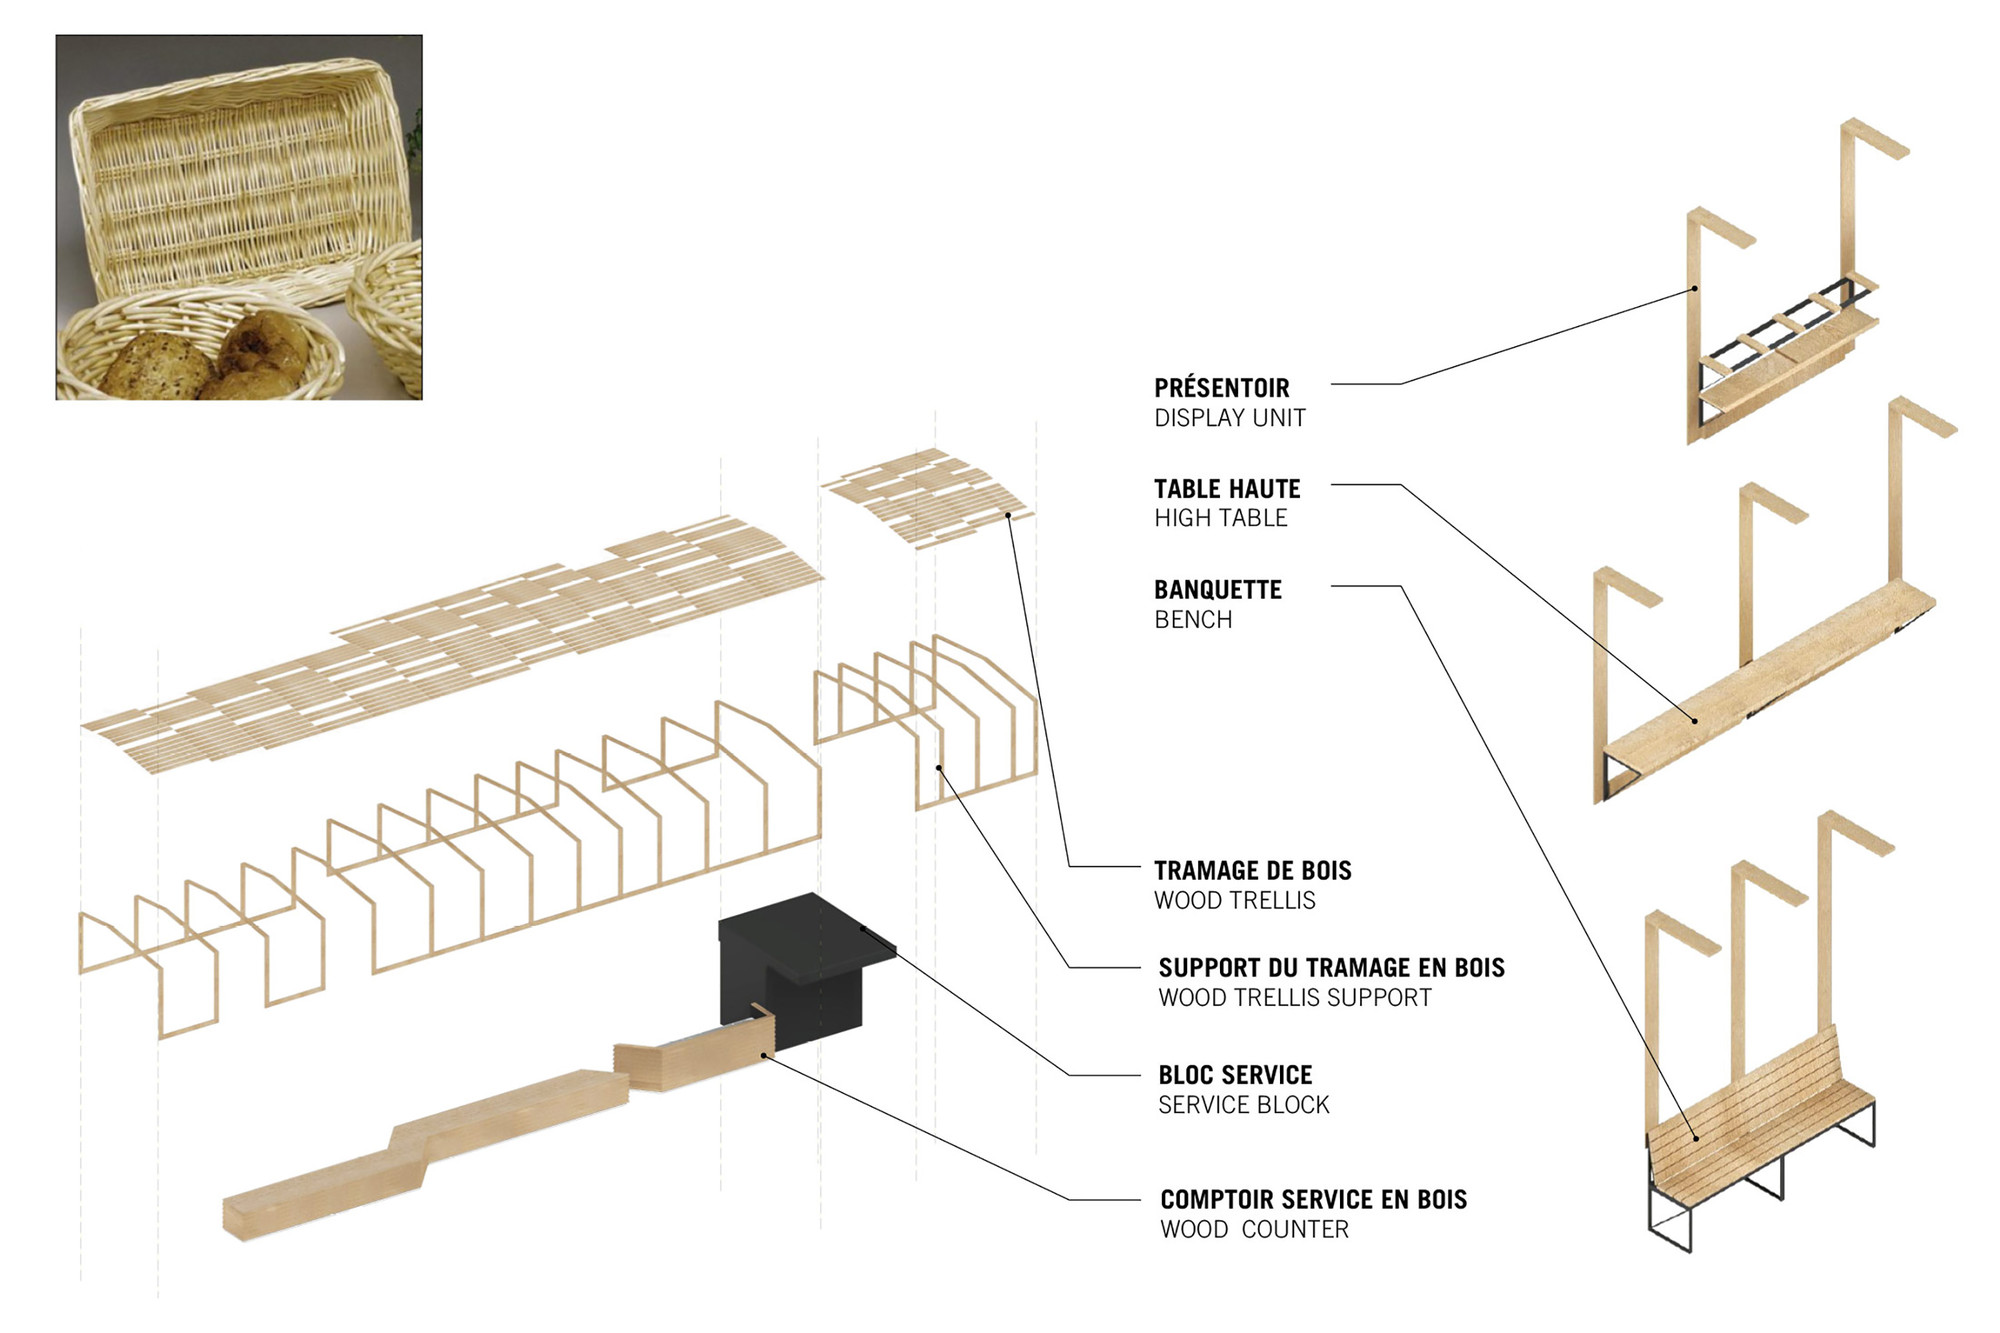 raid 5 concept with diagram vdo tachometer hour meter wiring gallery of au pain doré naturehumaine 18